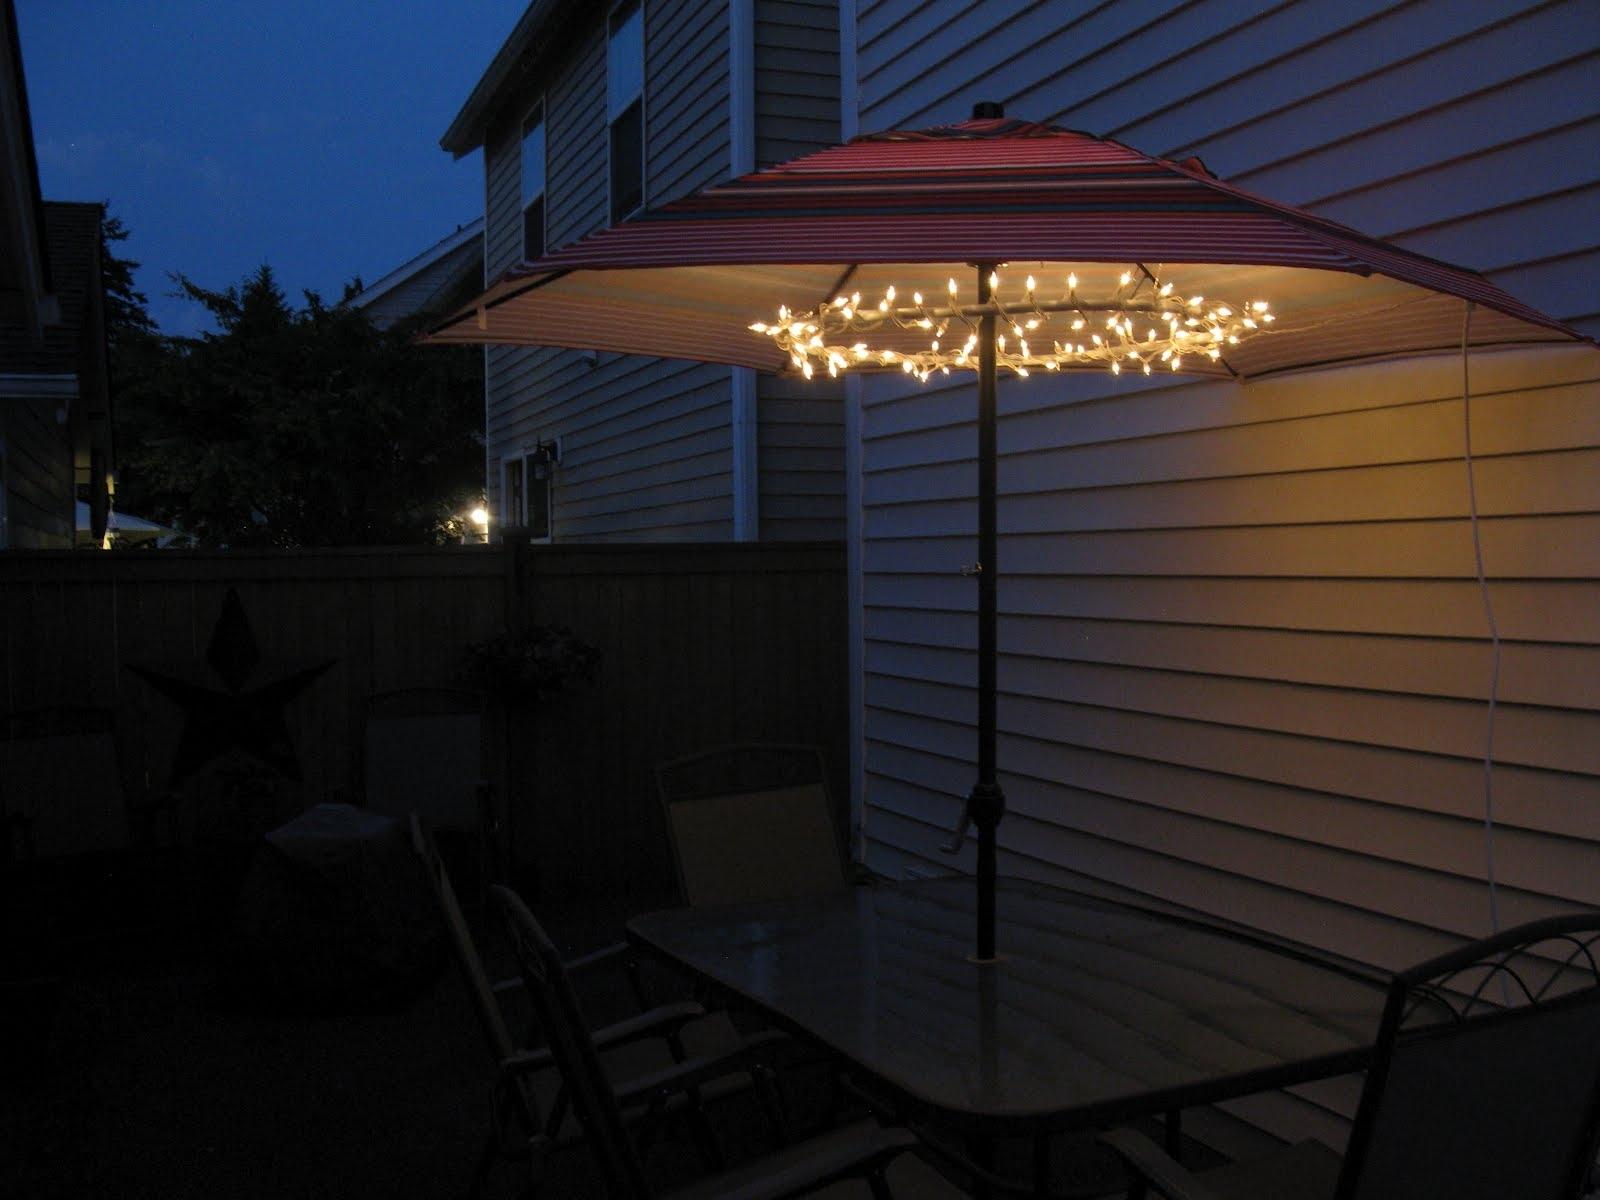 Amazing Patio Umbrella Lights — Wilson Home Ideas : Beautiful Patio Pertaining To 2019 Solar Patio Umbrellas (View 2 of 20)